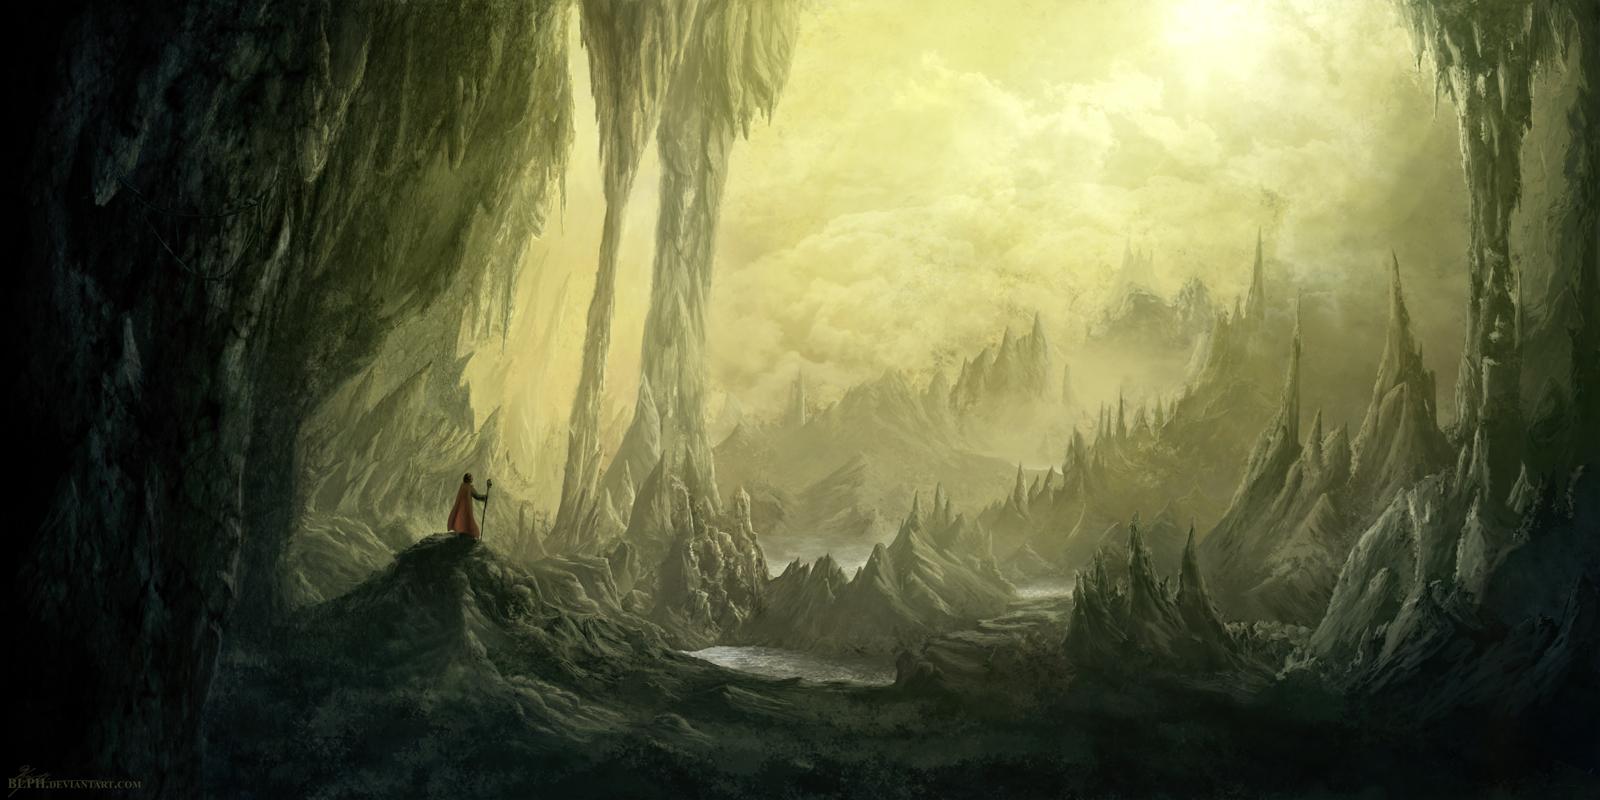 Badlands by BLPH